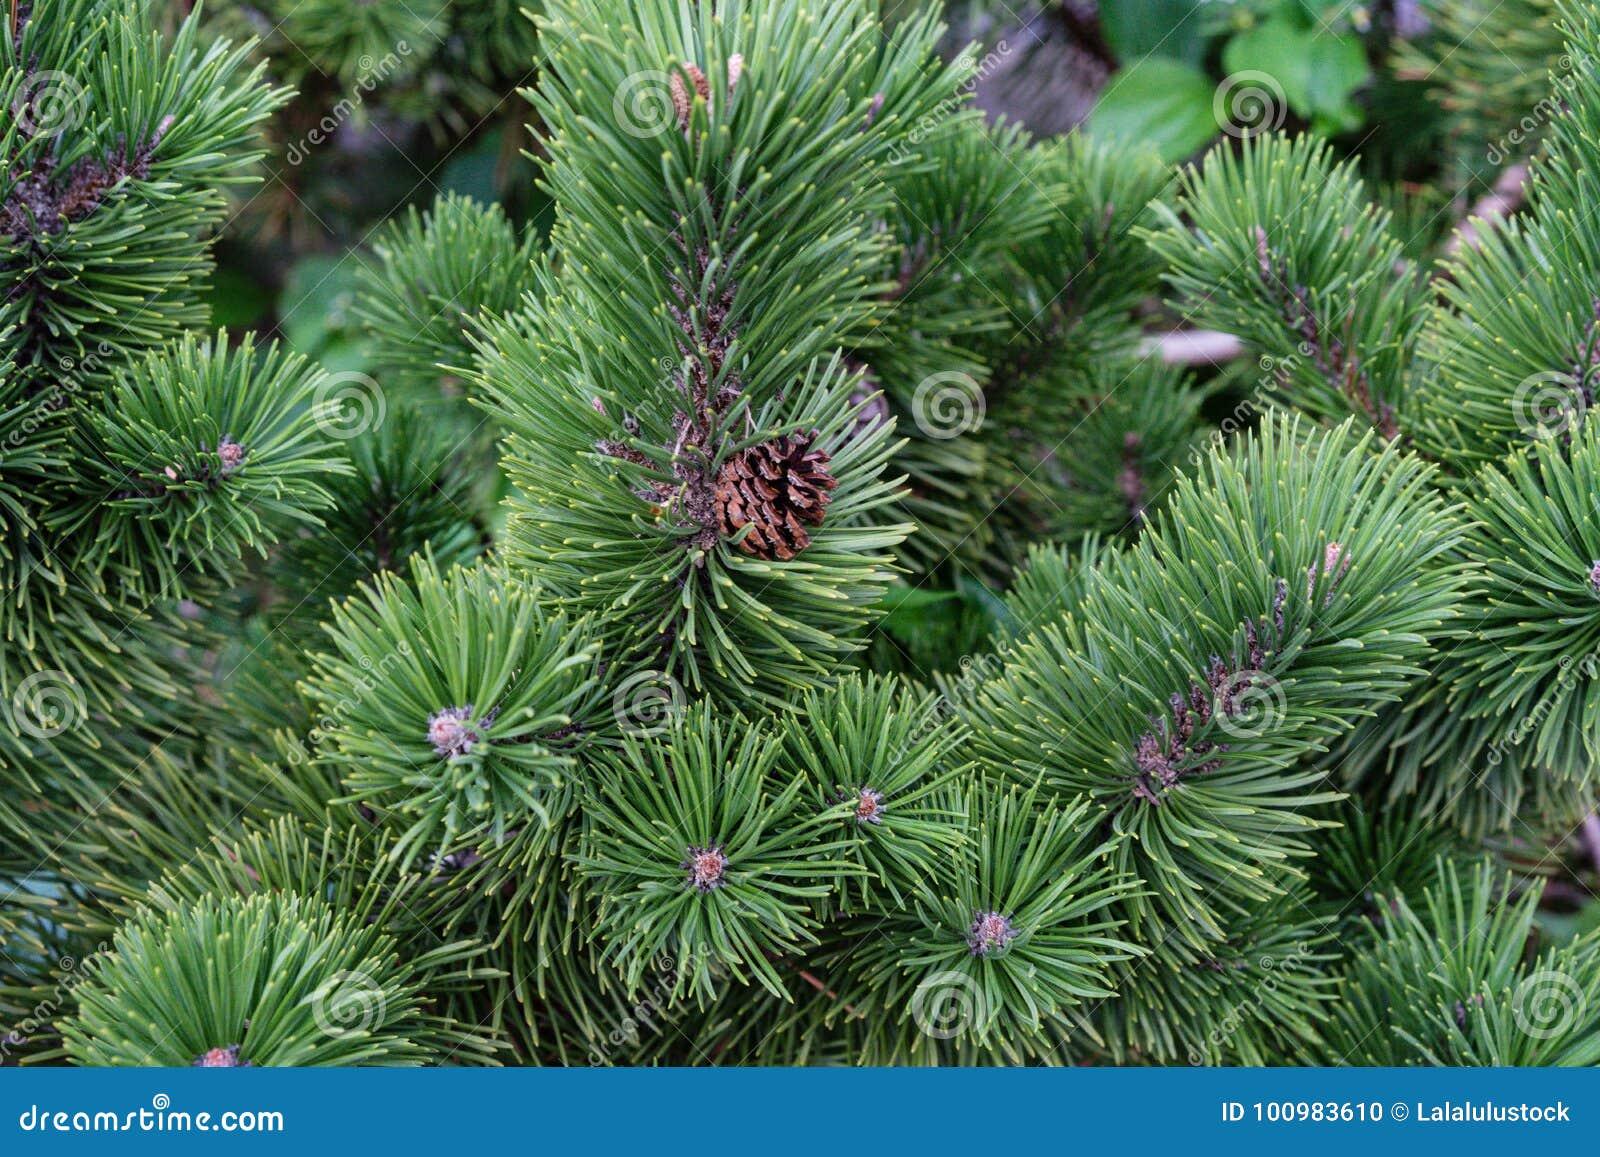 pine tree close up view green christmas tree needle macro with pinecone - Christmas Tree With Pine Cones